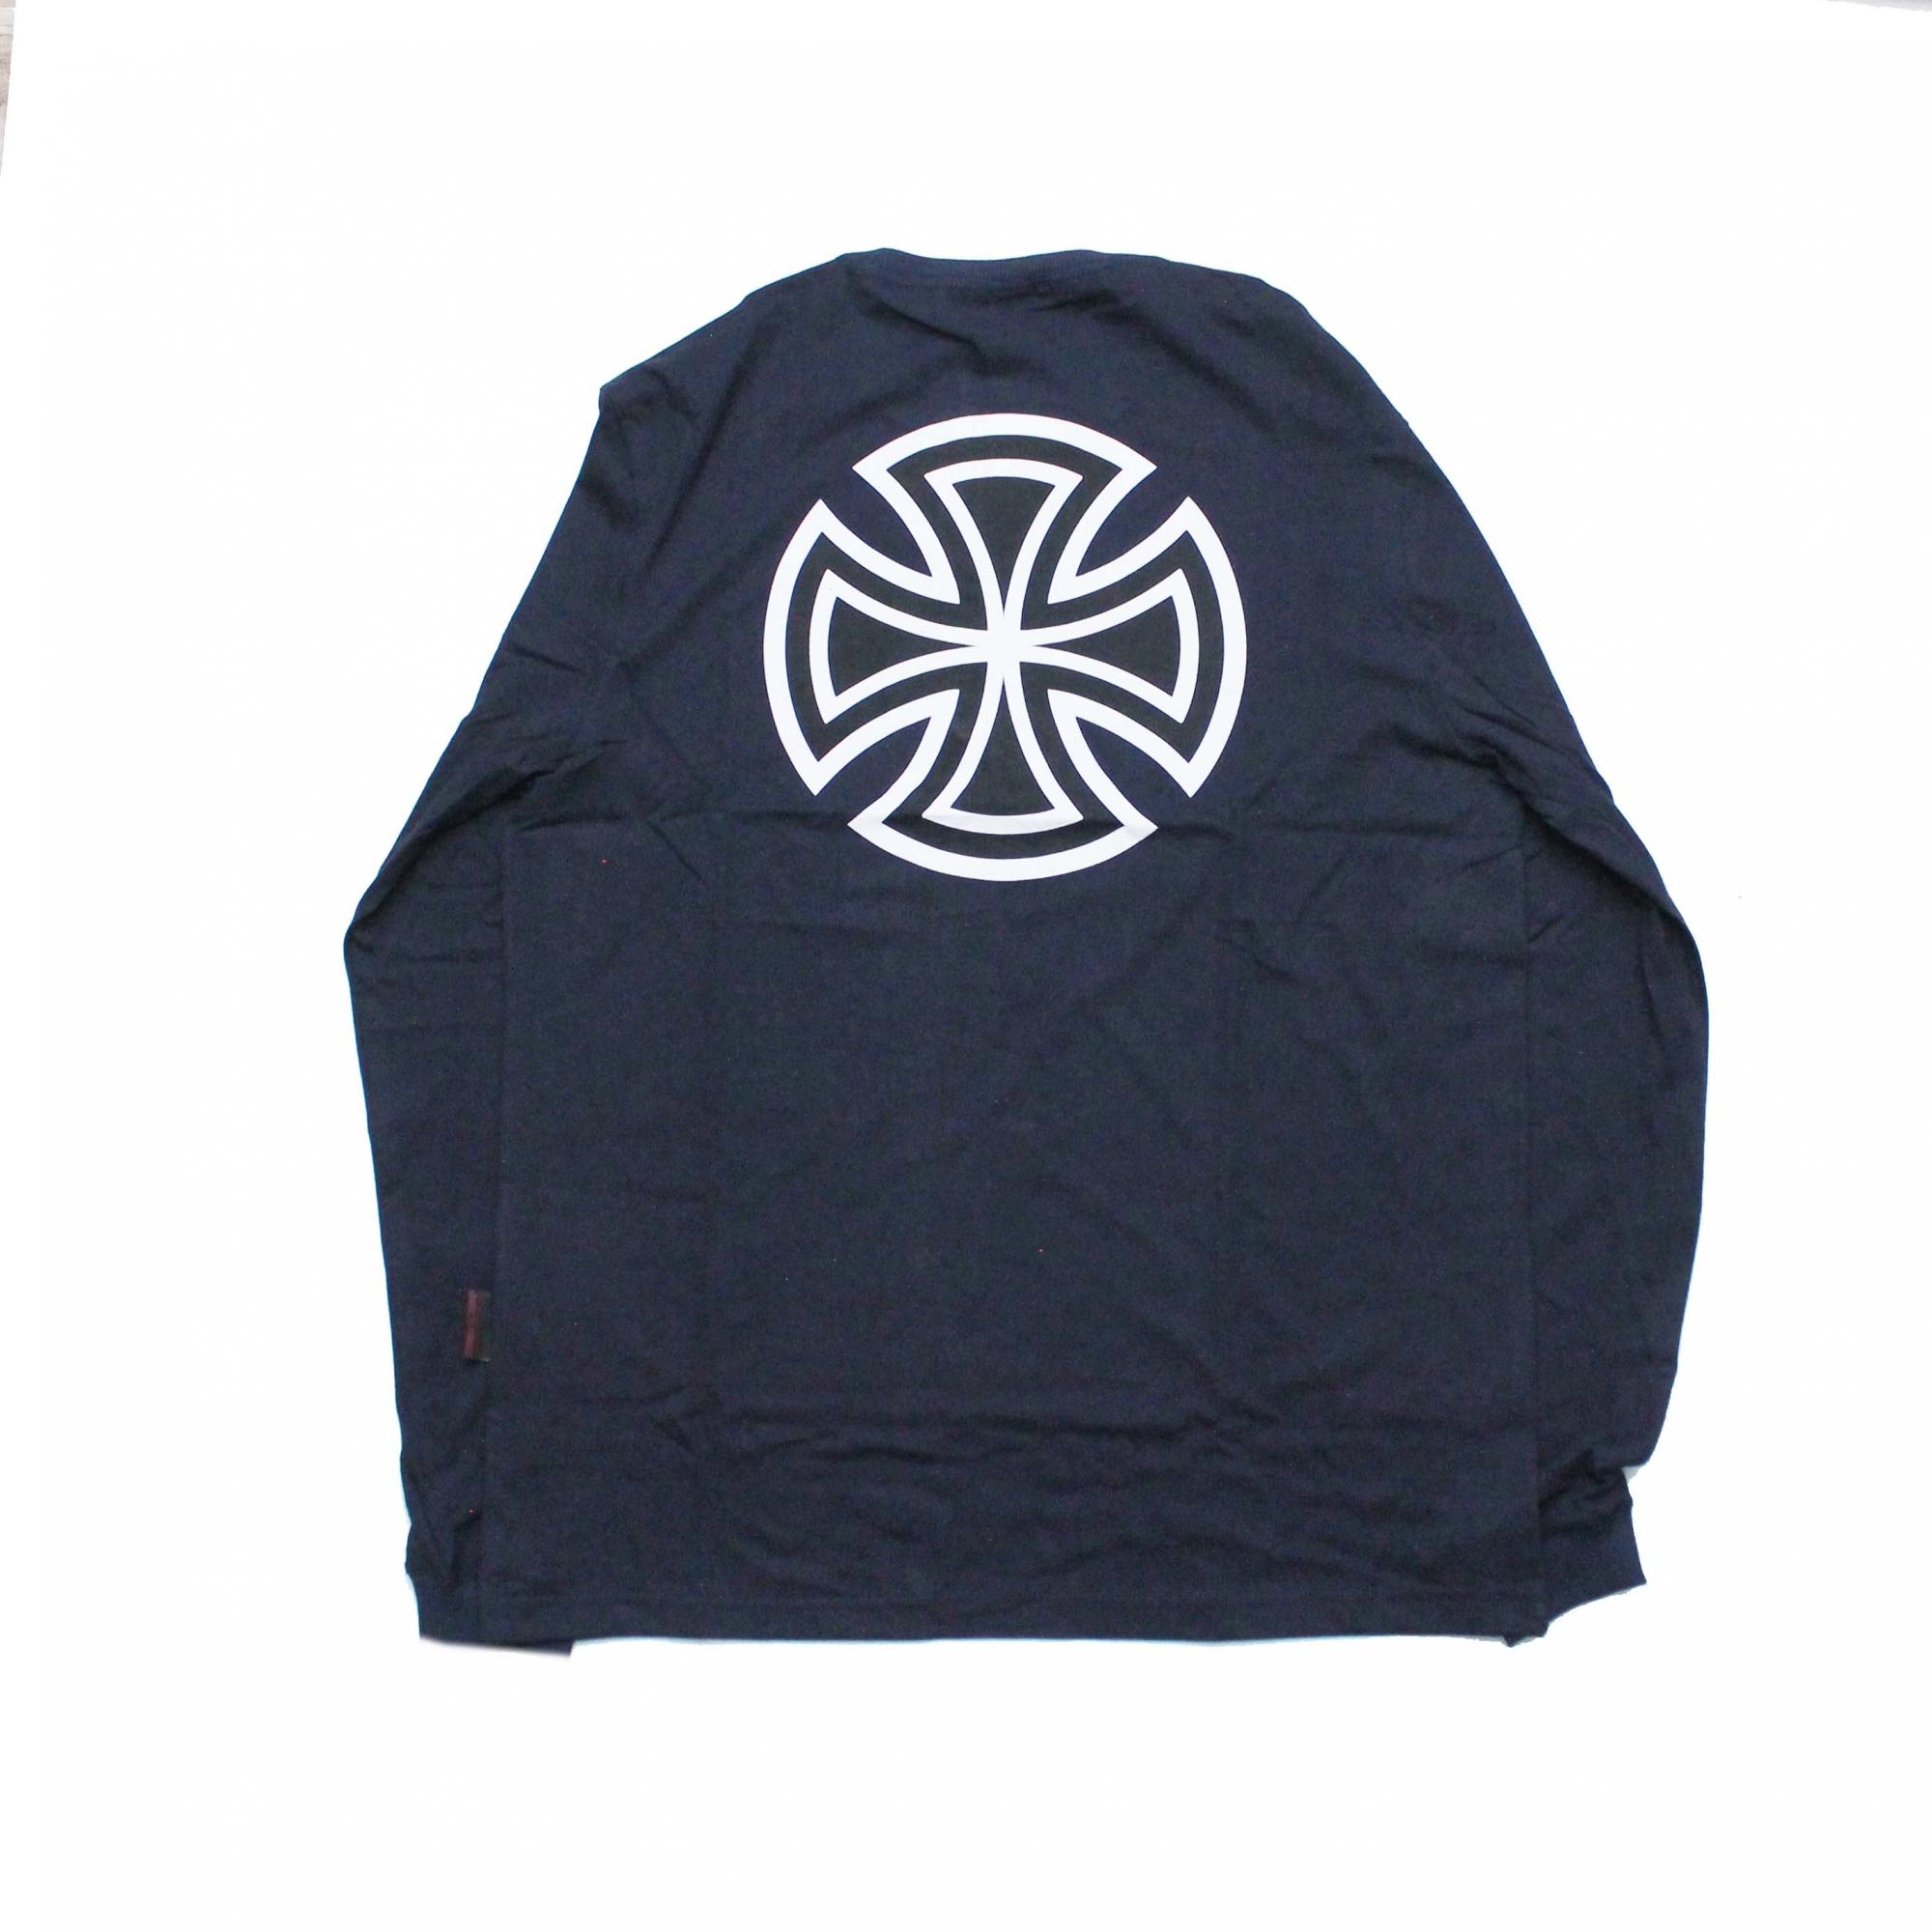 Camiseta Manga Longa Independent Black Bar Cross - Azul Marinho